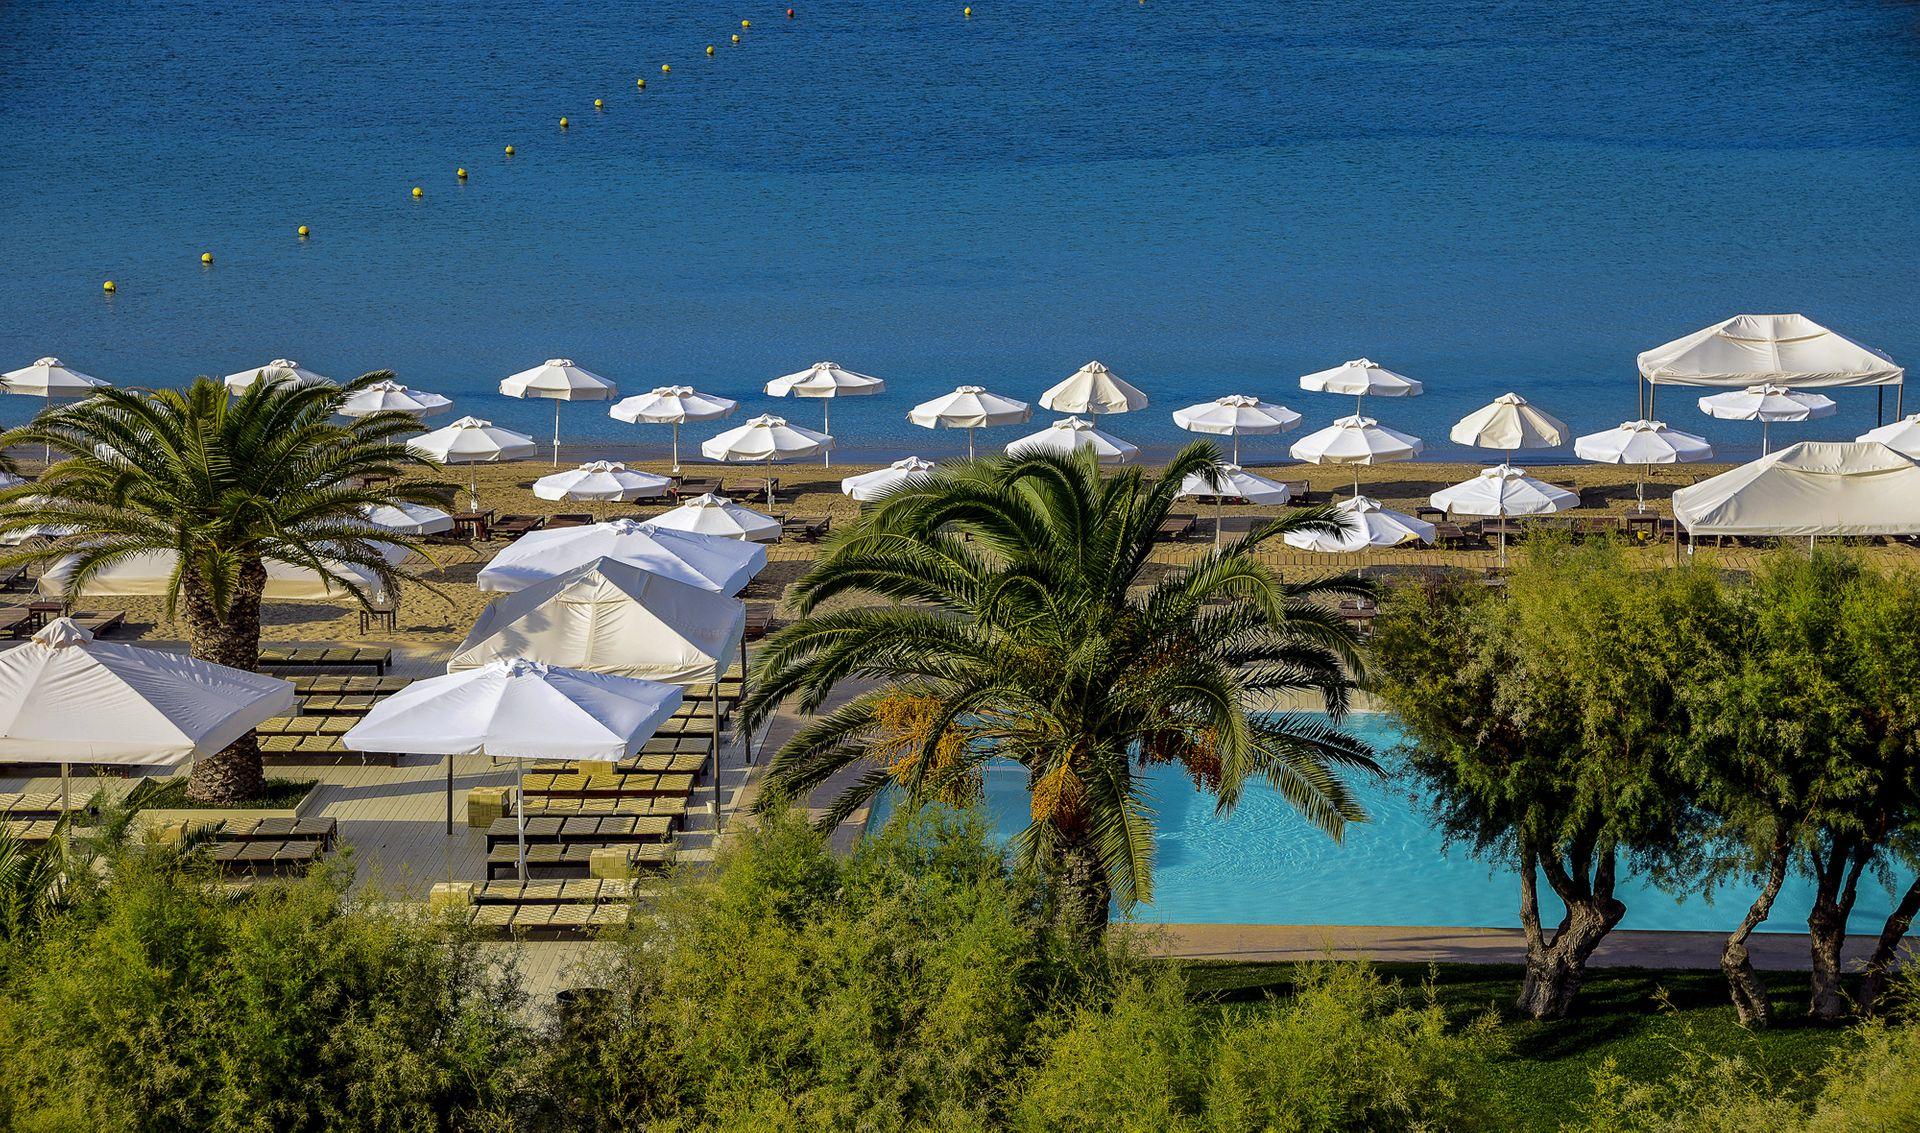 5* Plaza Resort Hotel - Ανάβυσσος ✦ -10% ✦ 2 Ημέρες (1 Διανυκτέρευση) ✦ 2 άτομα + 1 παιδί έως 11 ετών ✦ Πρωινό ✦ 01/09/2021 έως 30/09/2021 ✦ Μπροστά στην Παραλία!